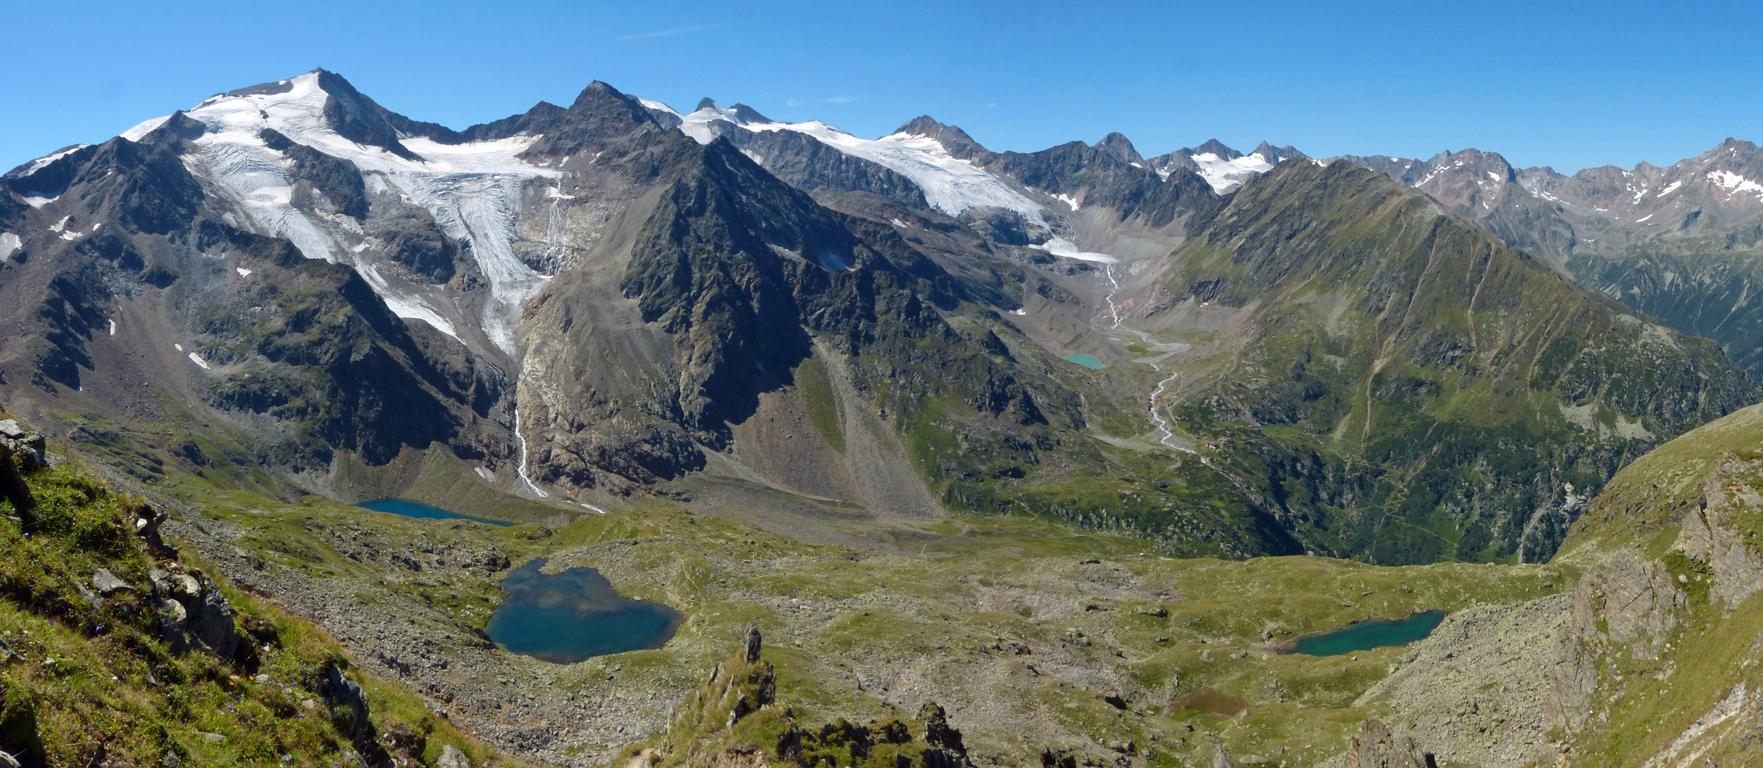 Bergpanorama auf dem Stubaier Höhenweg